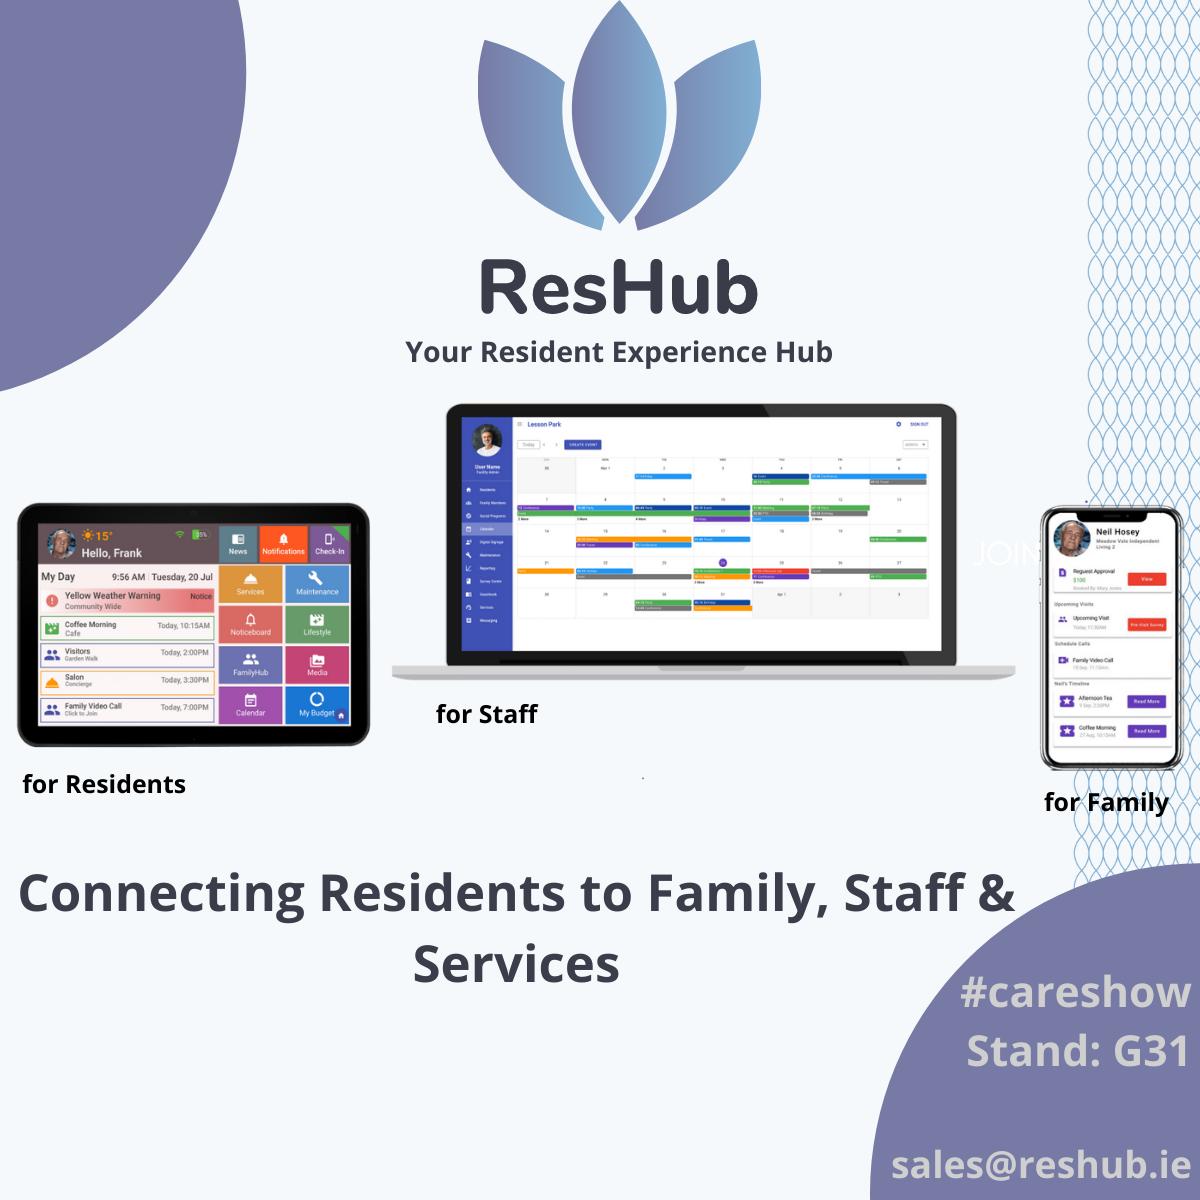 ResHub - Your Resident Experience Hub